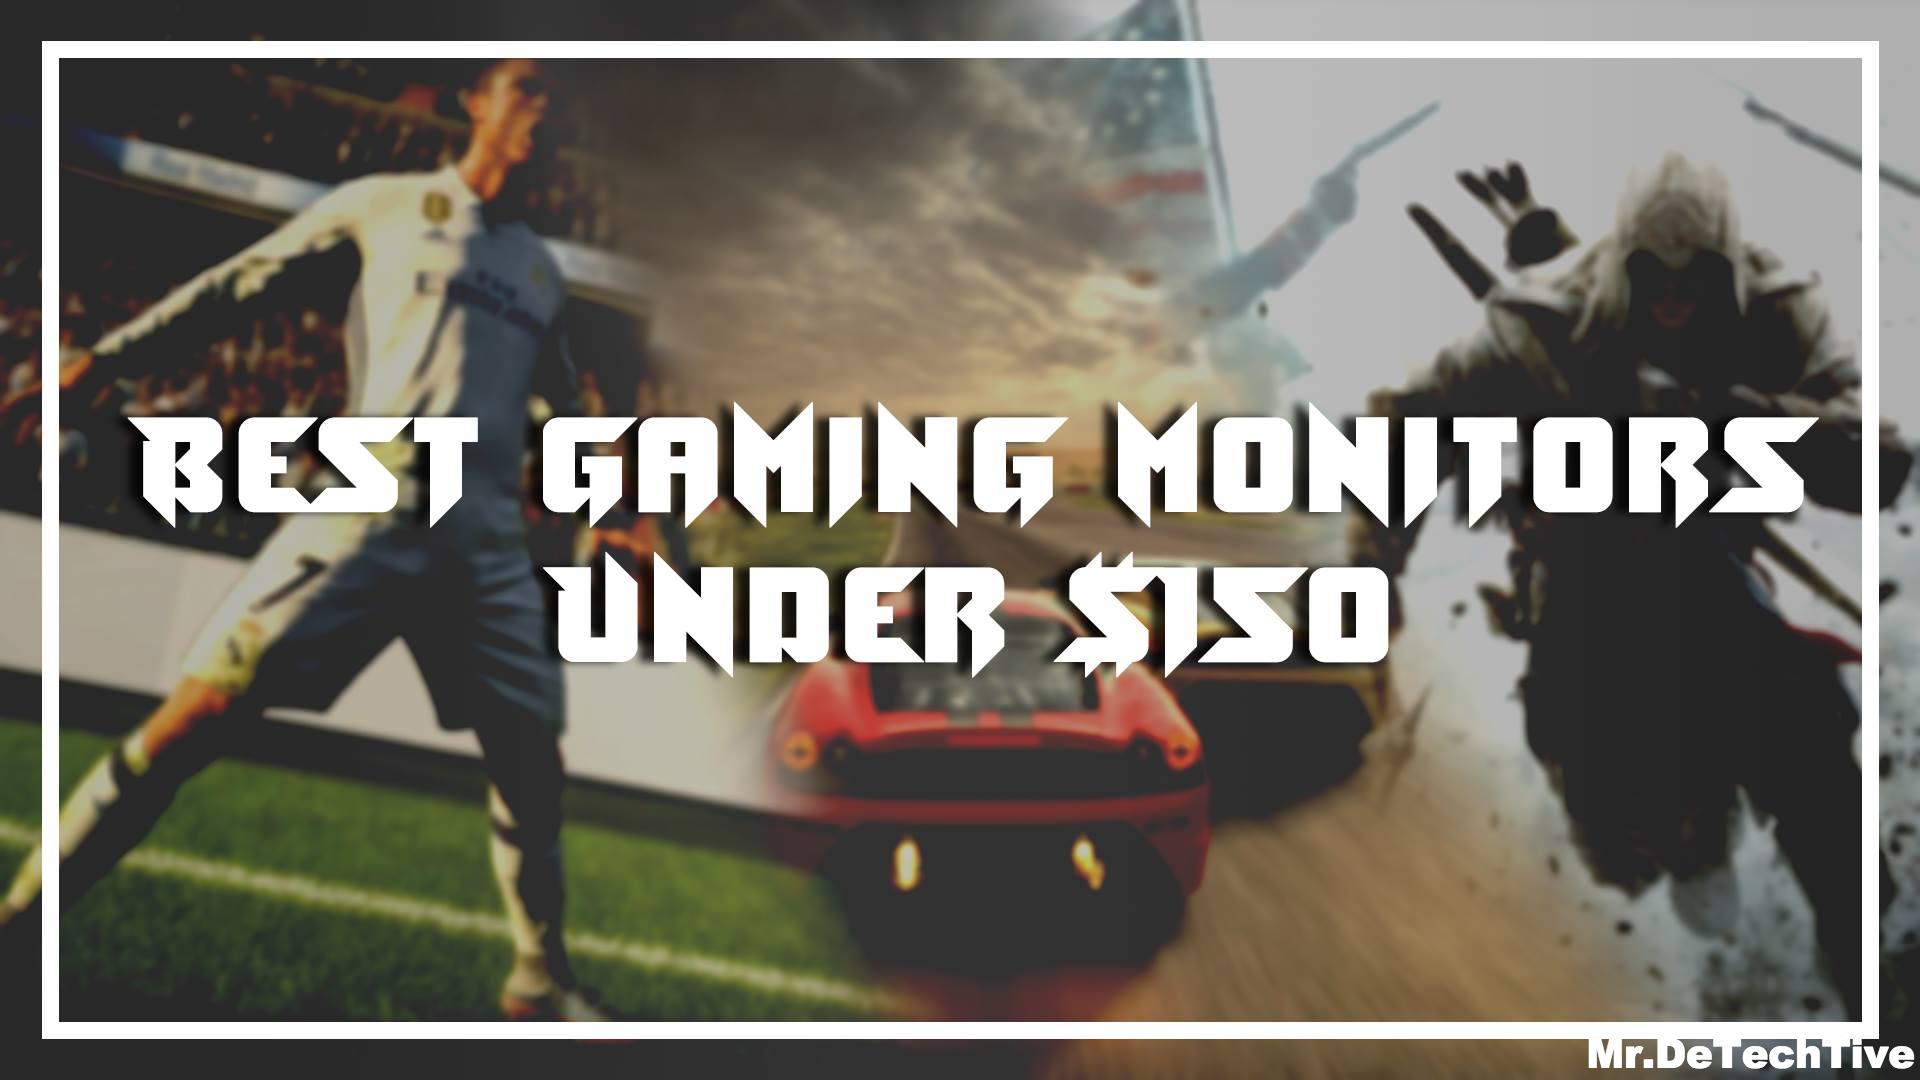 Best Gaming Monitors Under $150